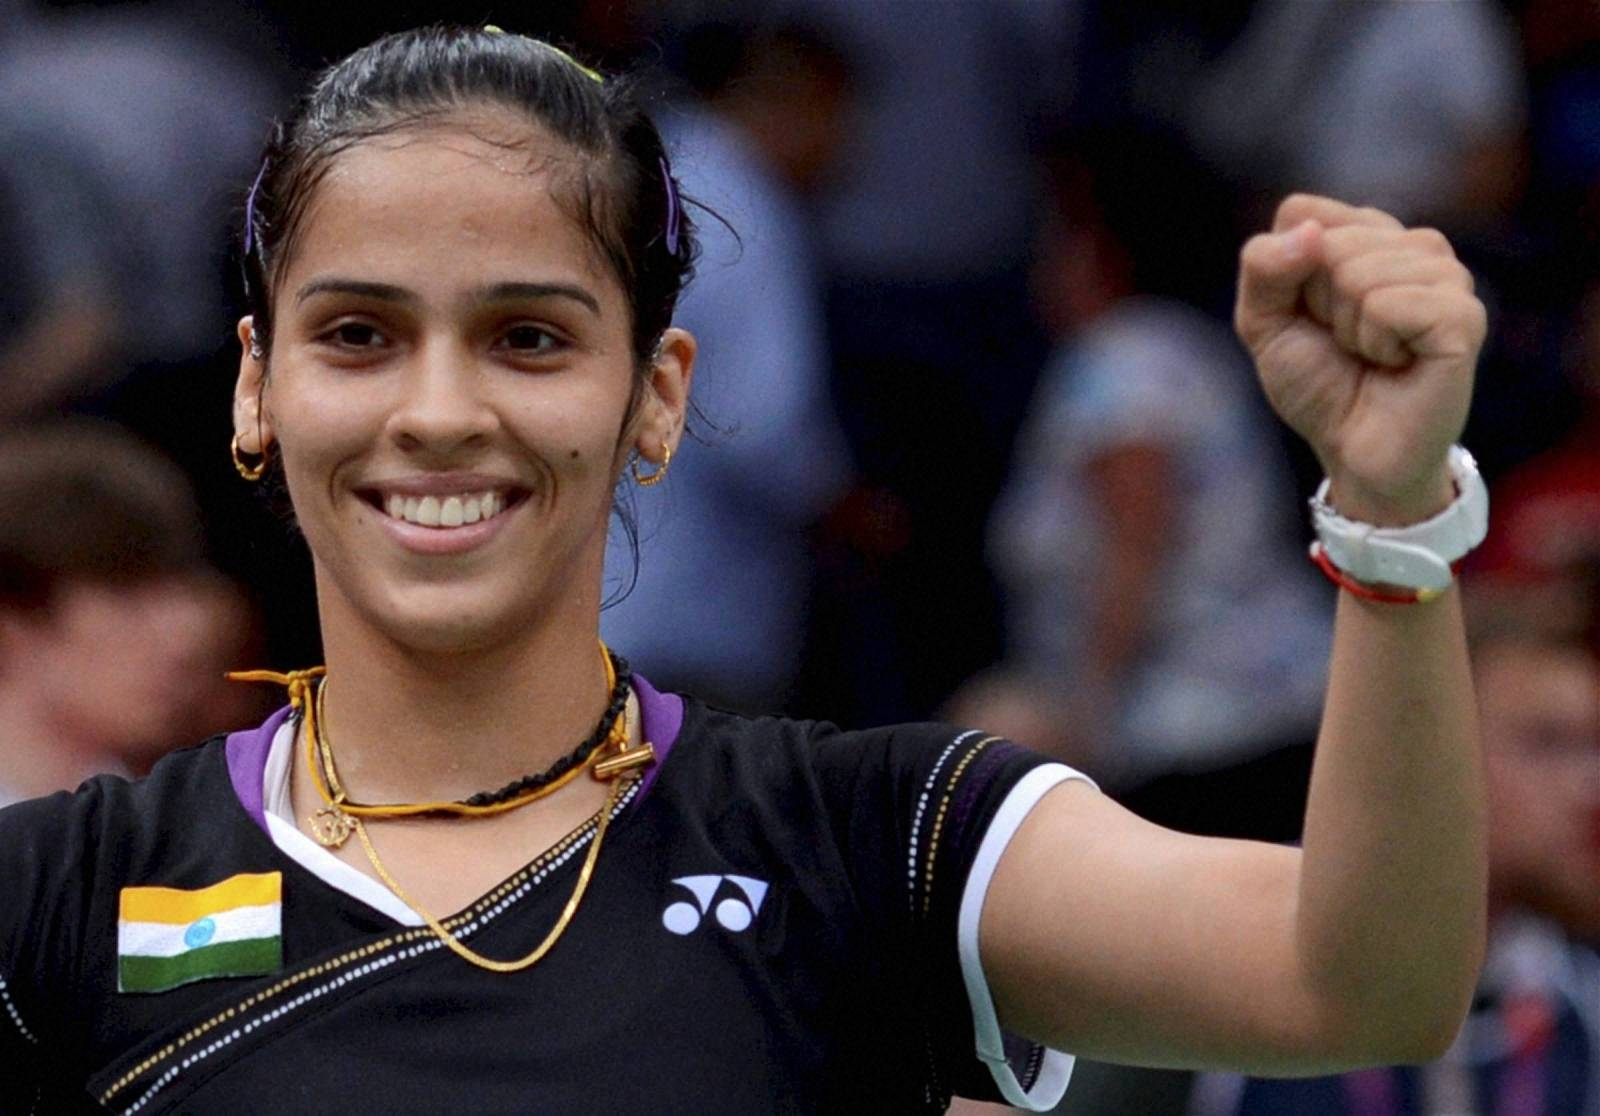 Saina Nehwal reaches Semis in the World Badminton Championships